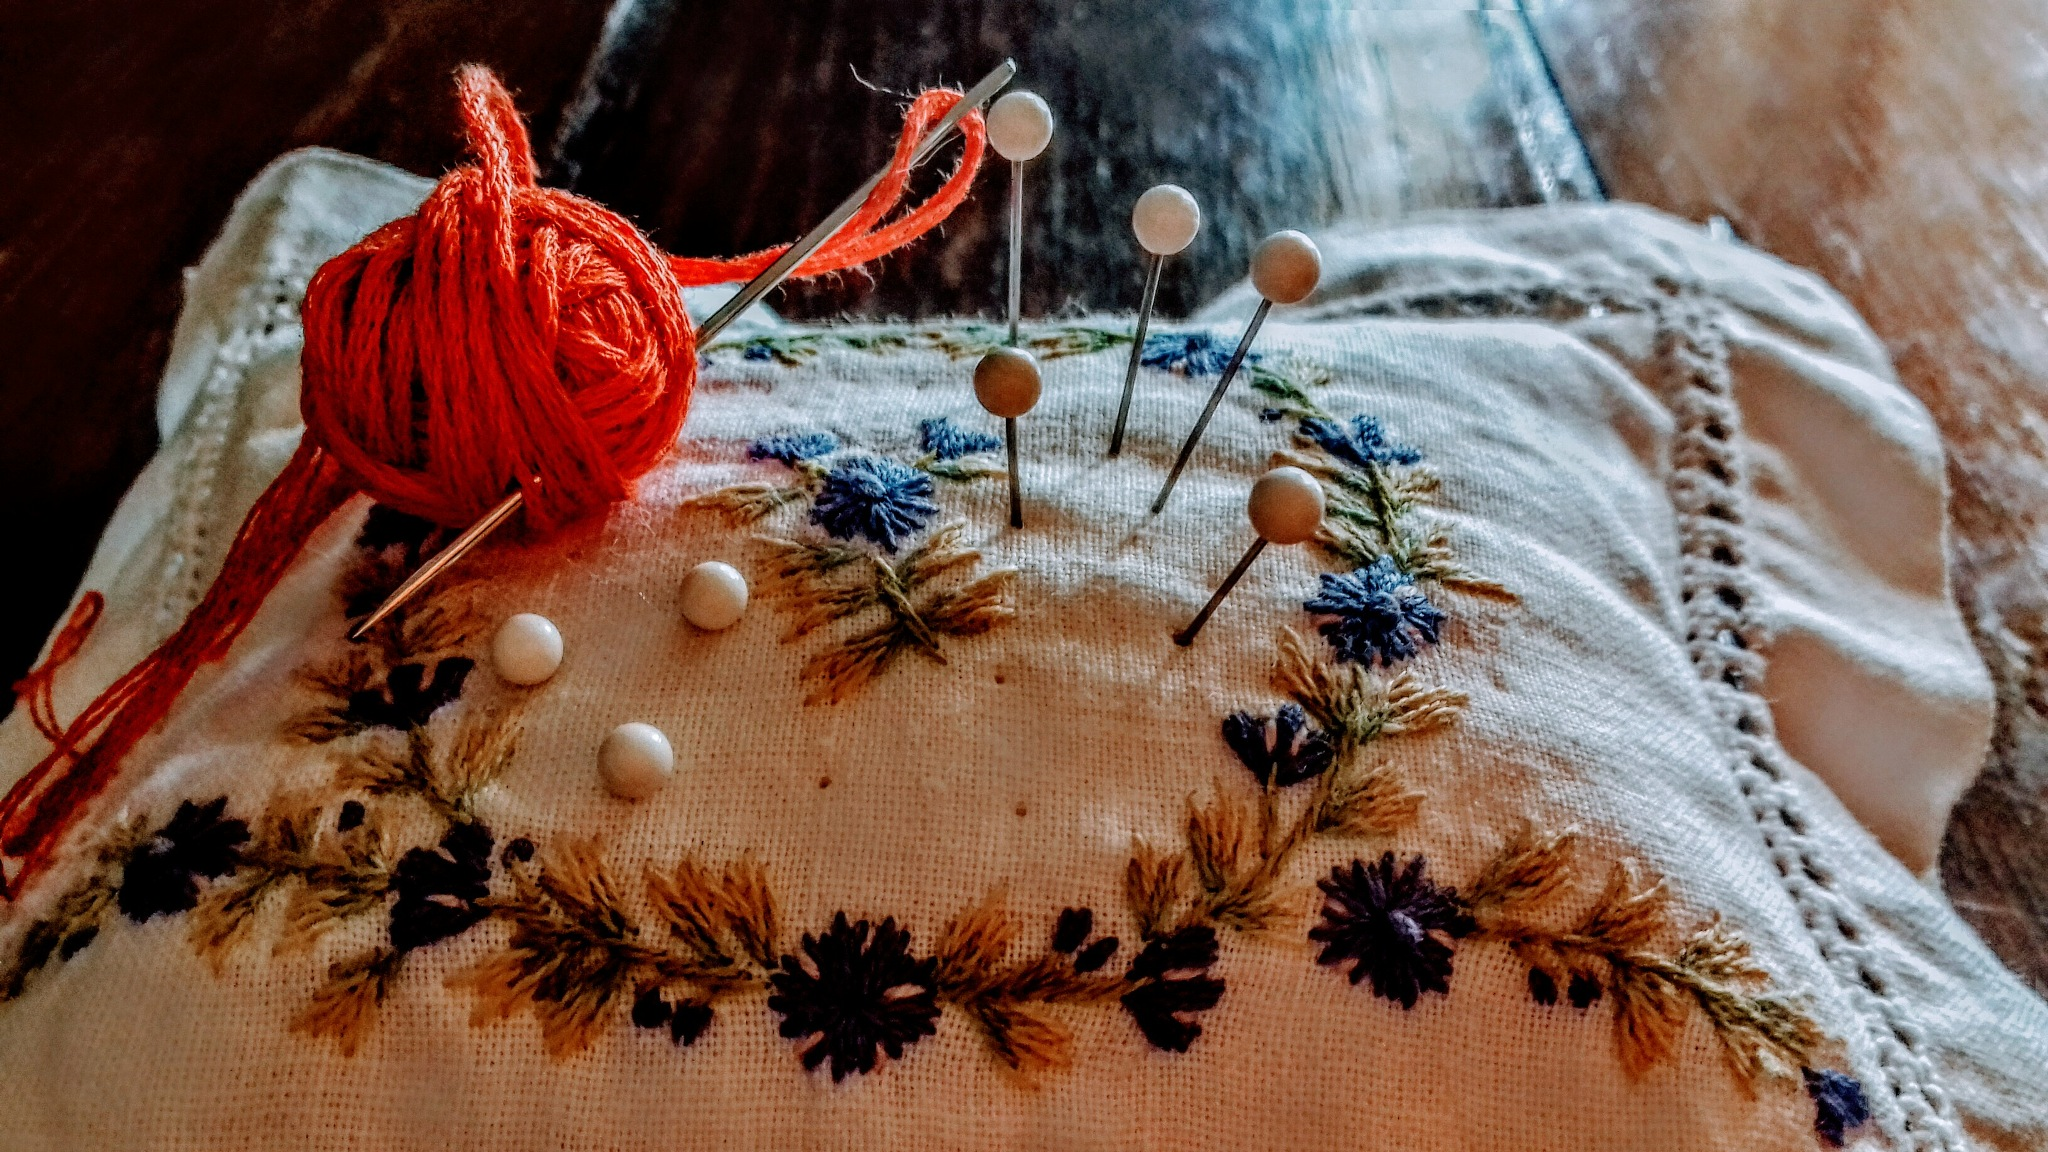 Thread of love. by m. cristina umpierrez albano.